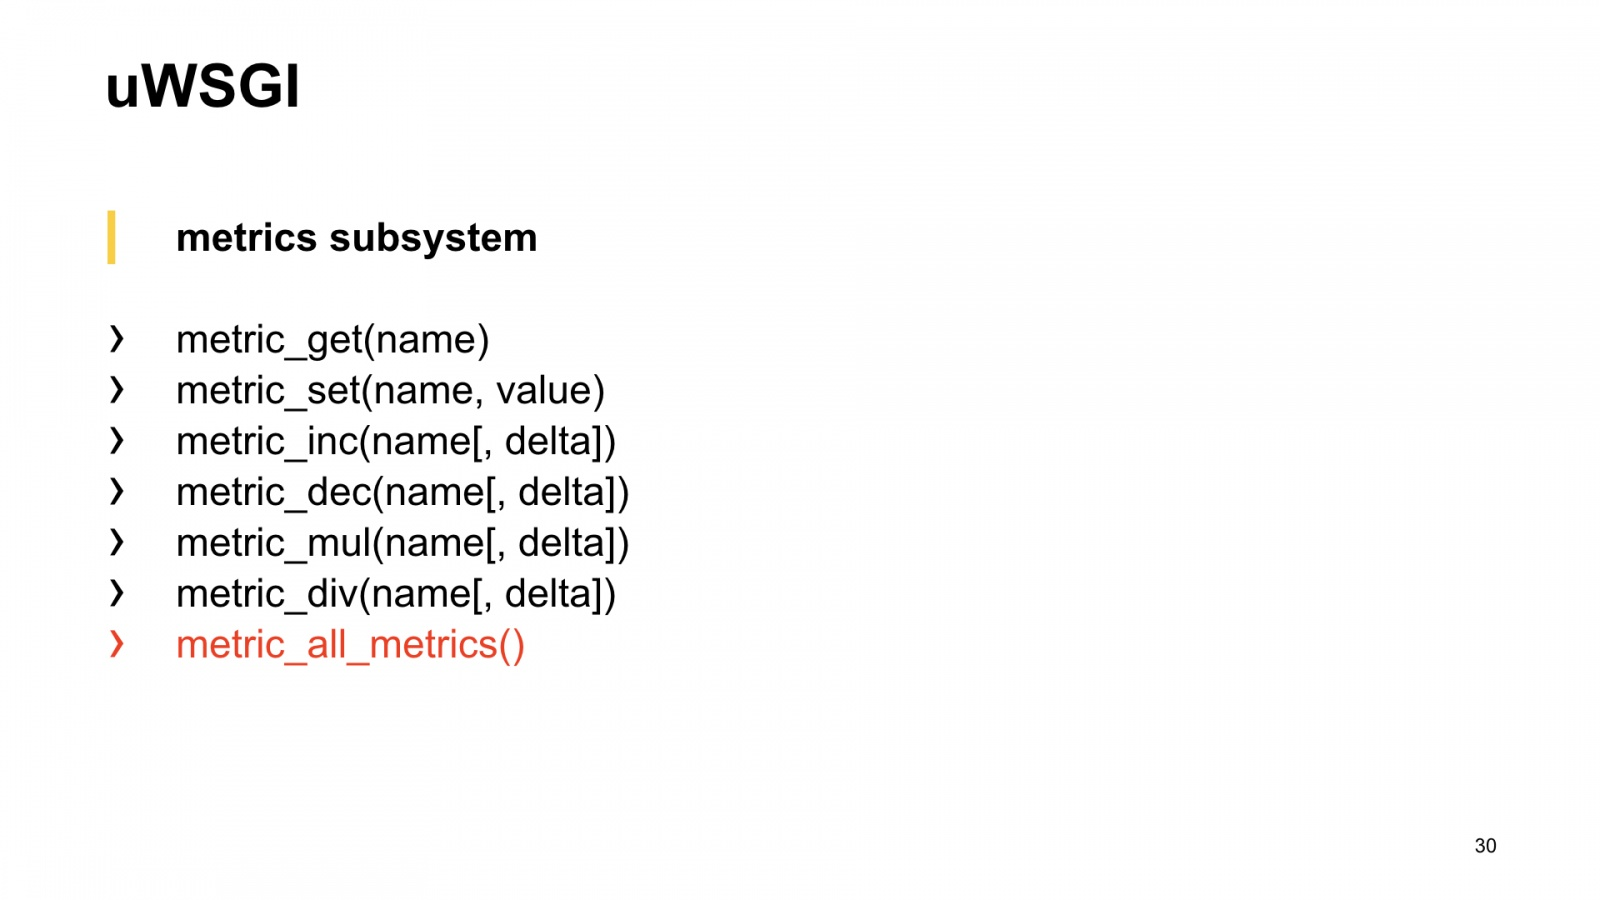 uWSGI в помощь метрикам. Доклад Яндекса - 22